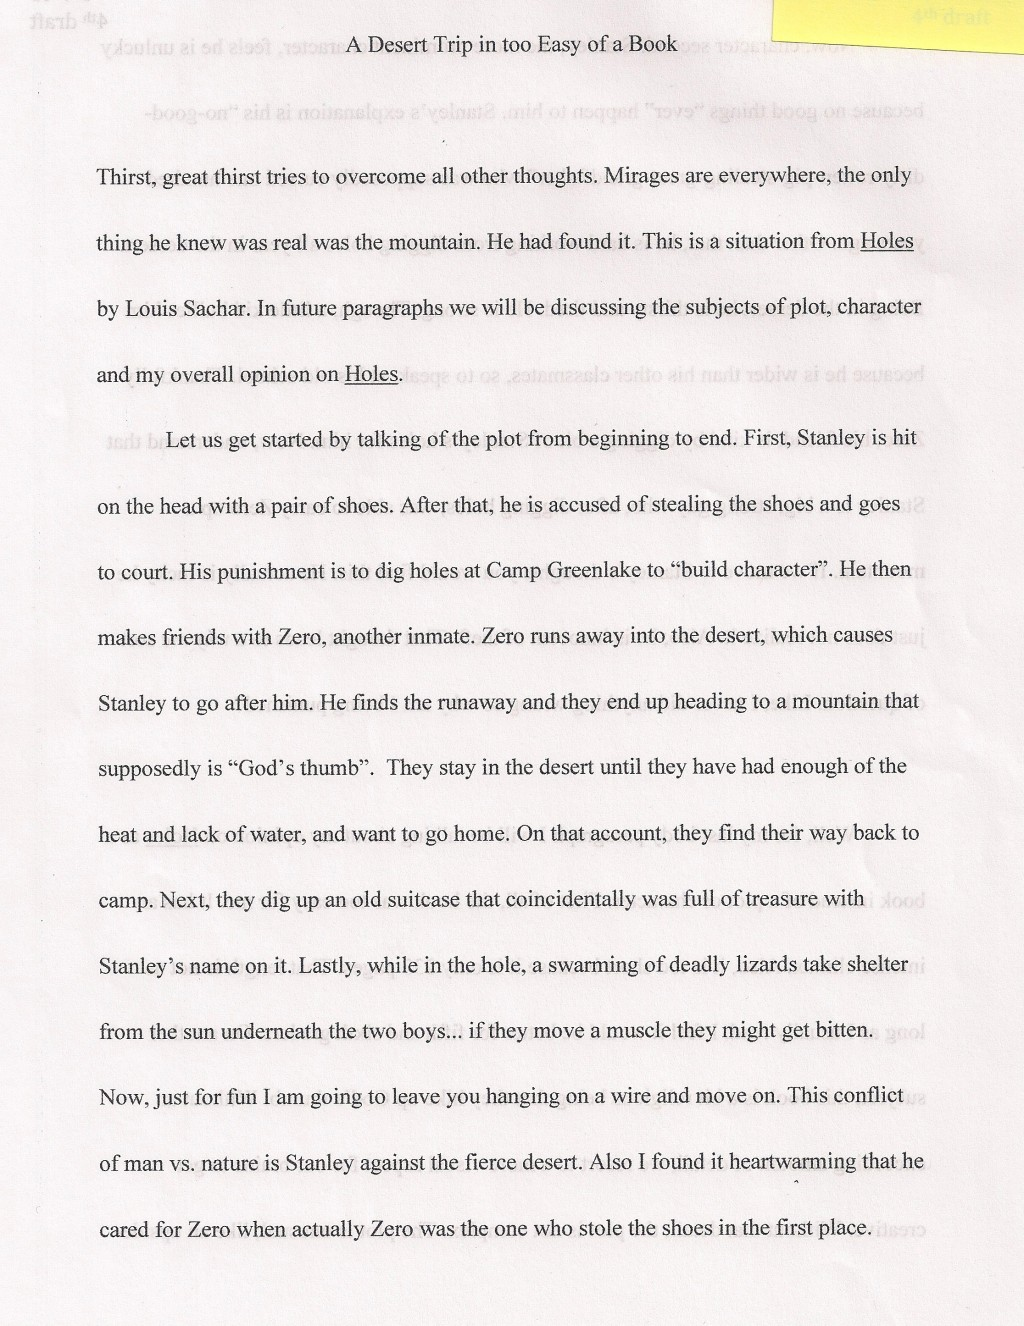 014 6th Grade Argumentative Essay Topics Example Desert Unique Sixth 6 Writing Prompts Large